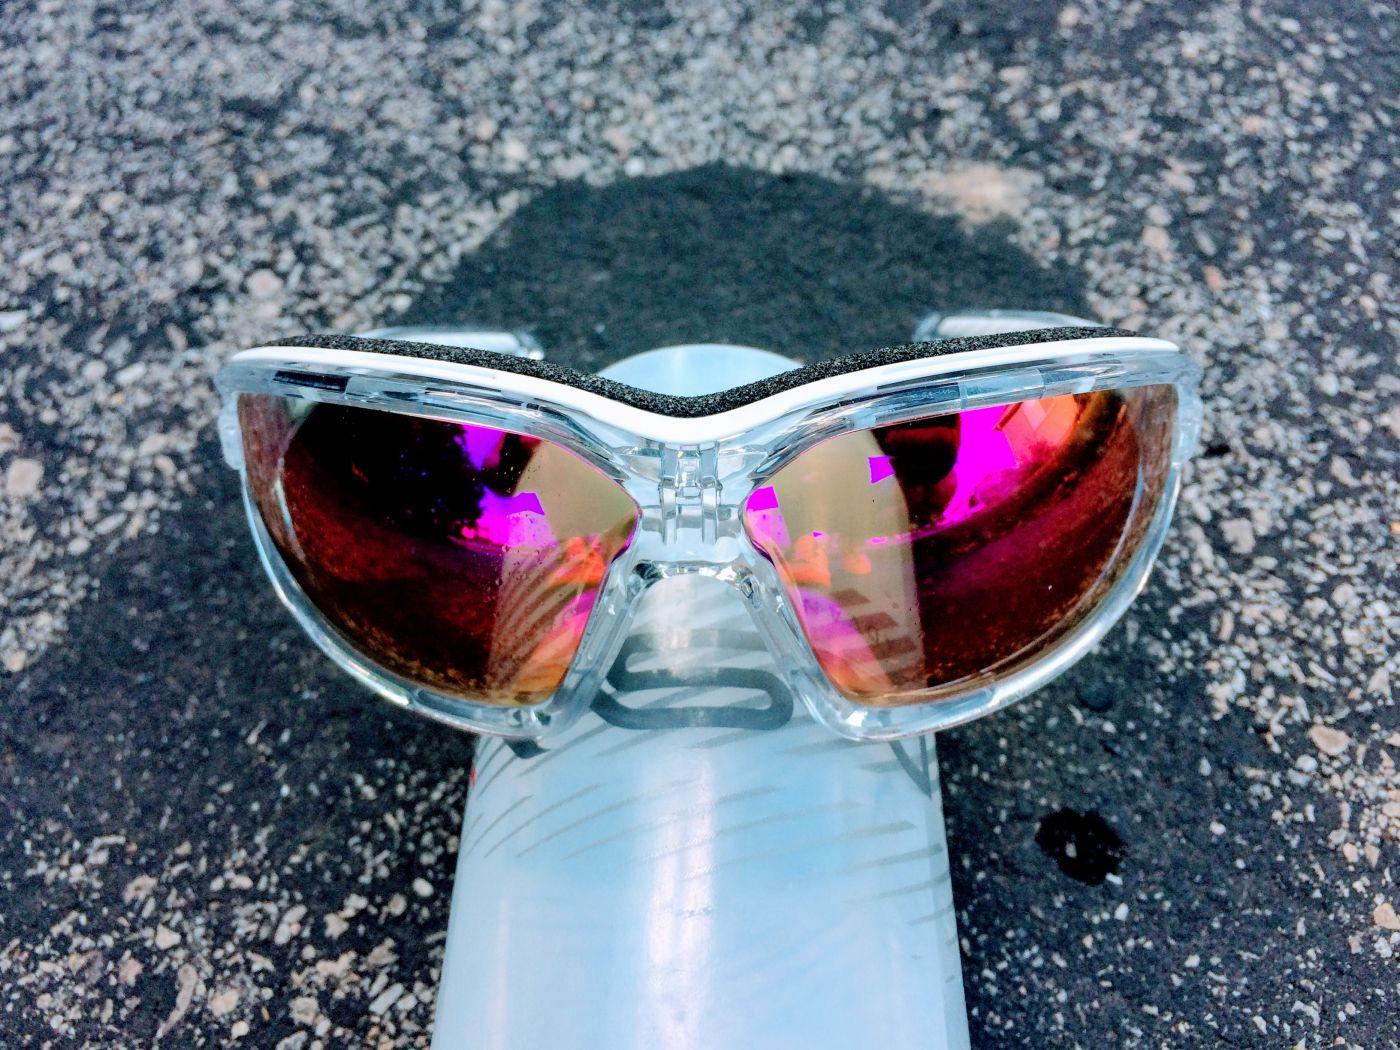 sombras de nuevo estilo de vida lindos zapatos Adidas Evil Eye Evo Pro Sunglasses Review - FeedTheHabit.com